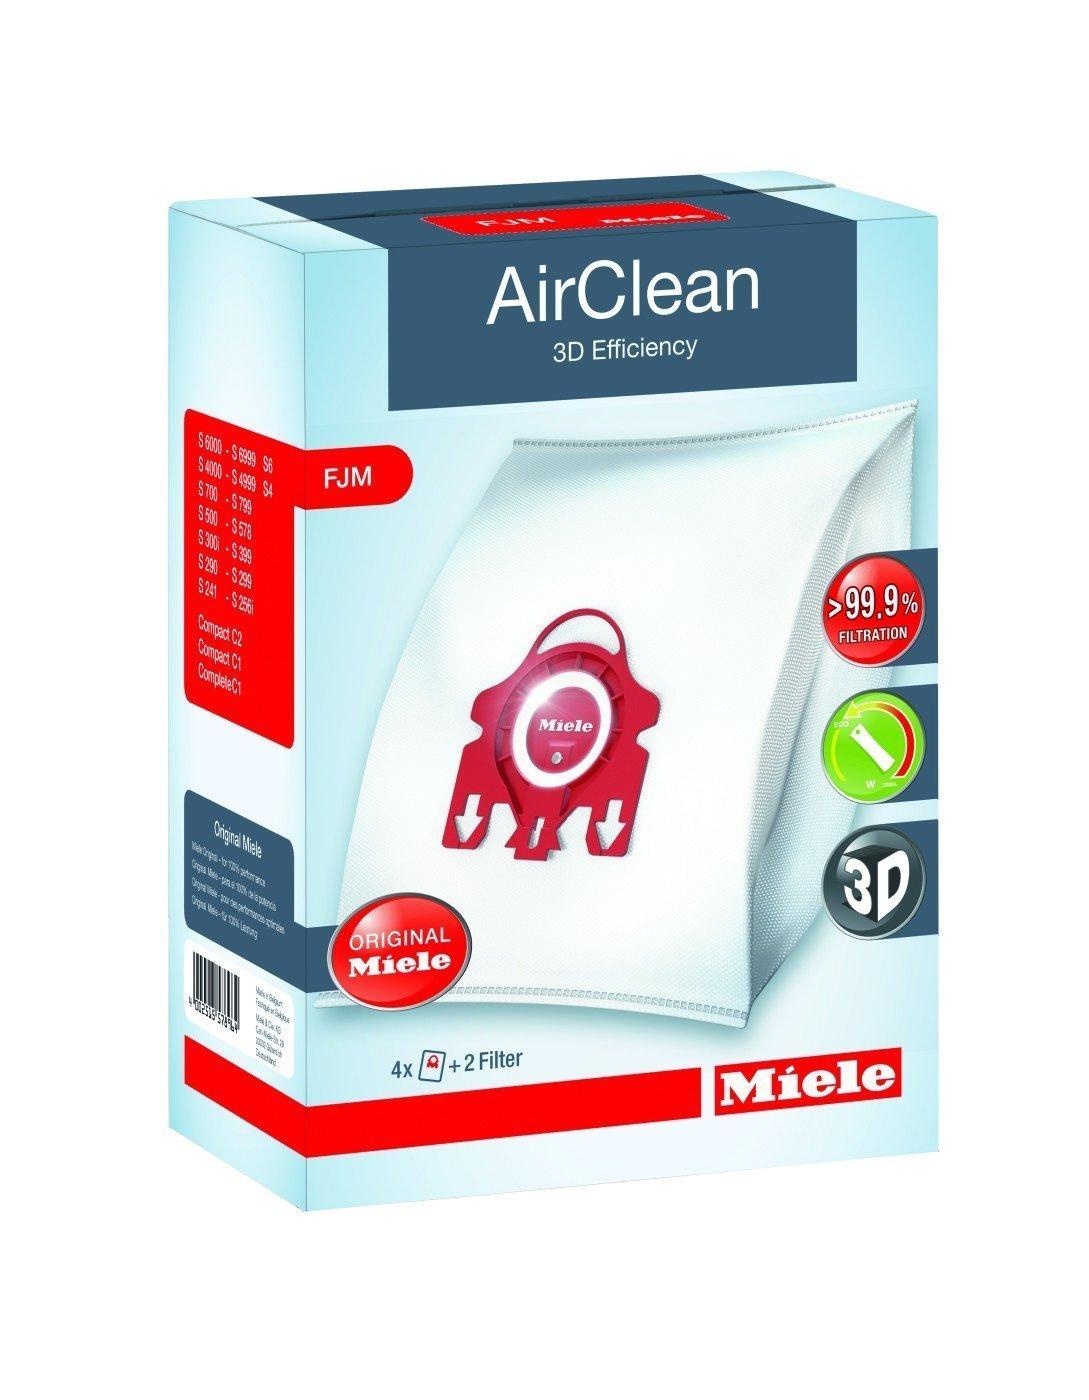 AirClean 3D Efficiency Dust Bag